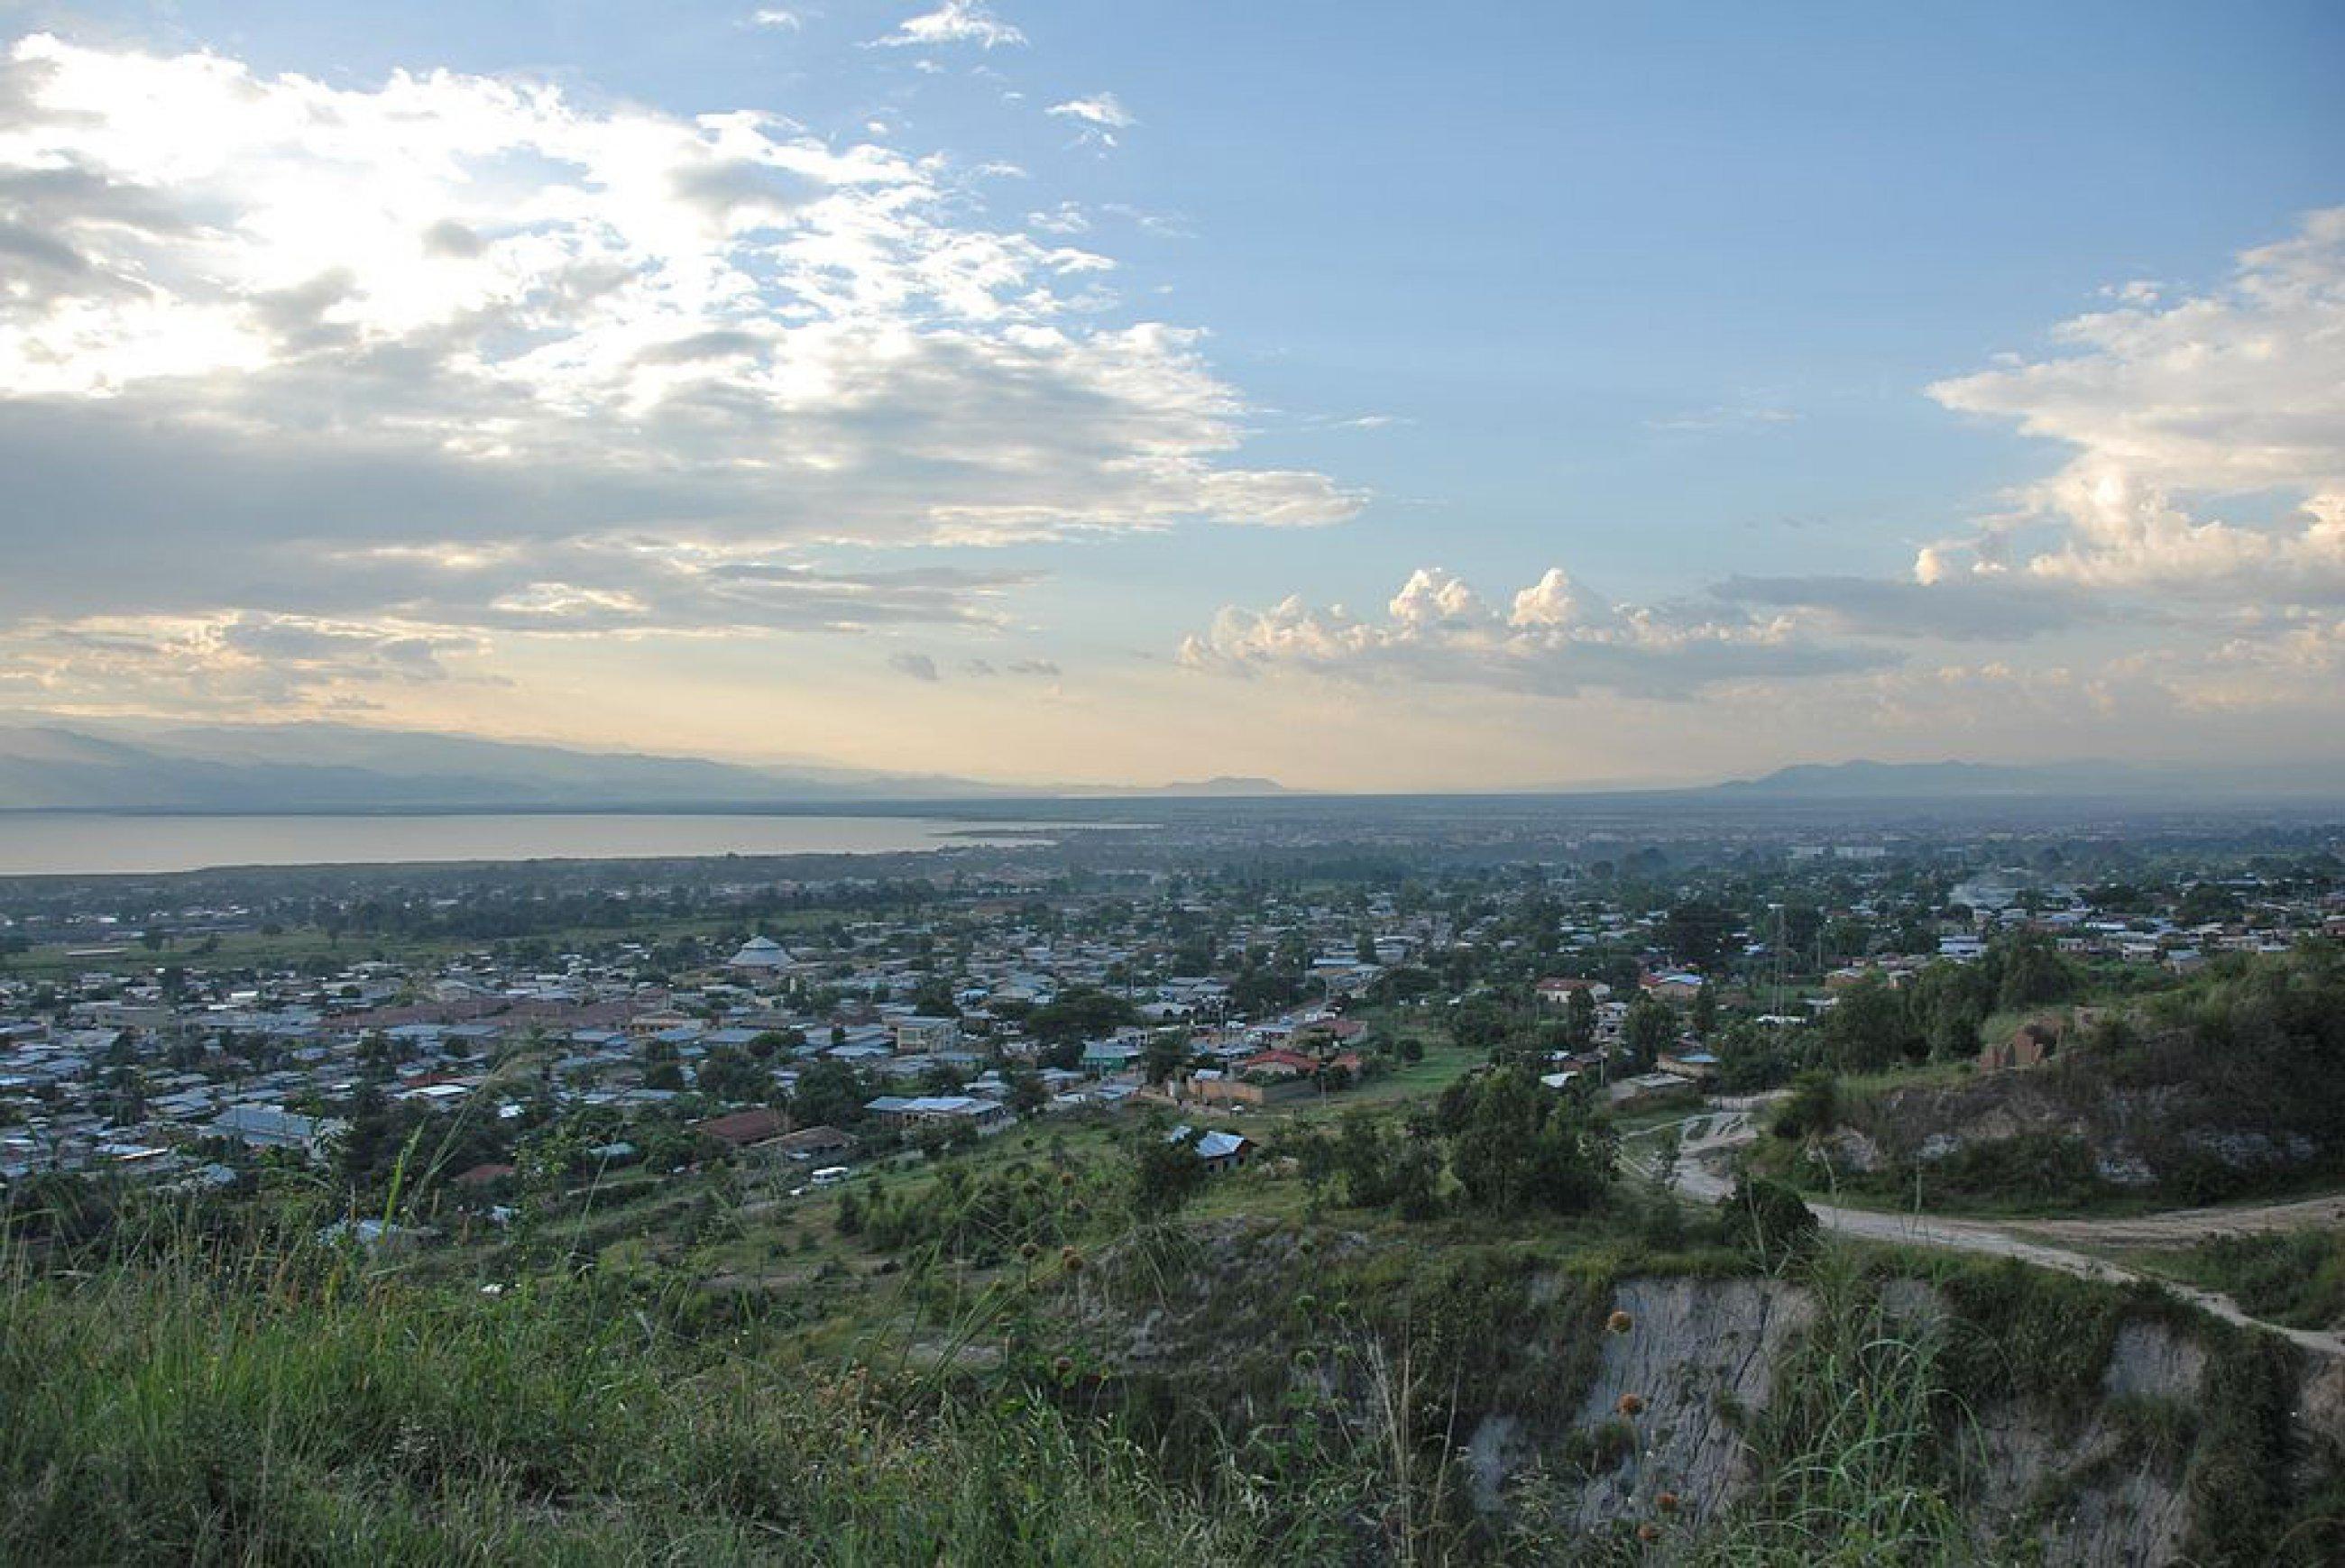 https://bubo.sk/uploads/galleries/4986/1024px-bujumbura-flickr-dave-proffer-2-.jpg